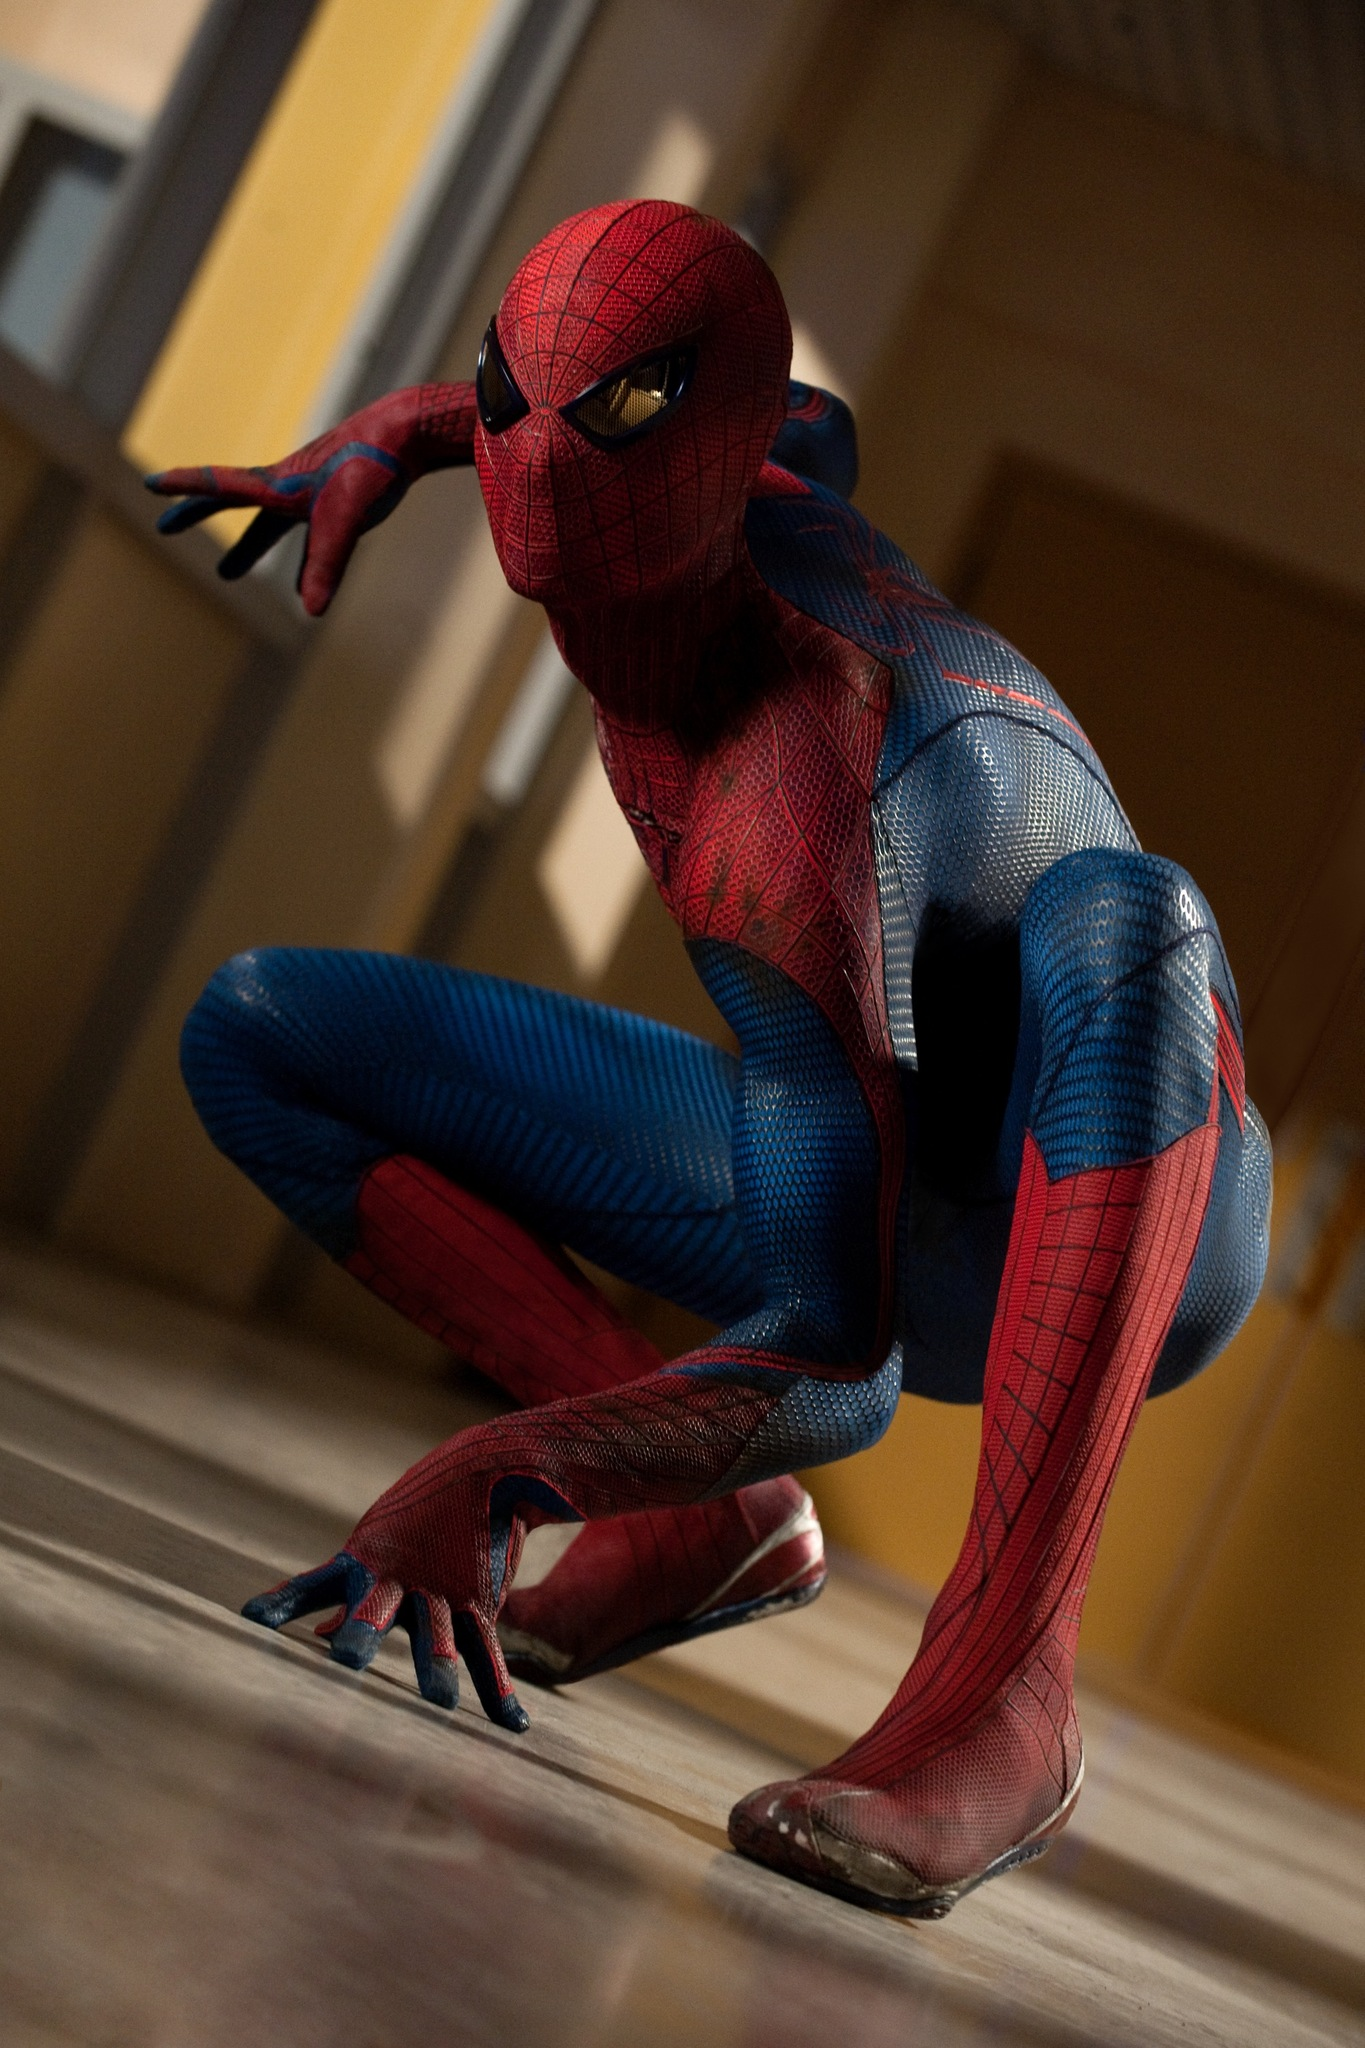 The Amazing Spider Man 2012 Photo Gallery Imdb